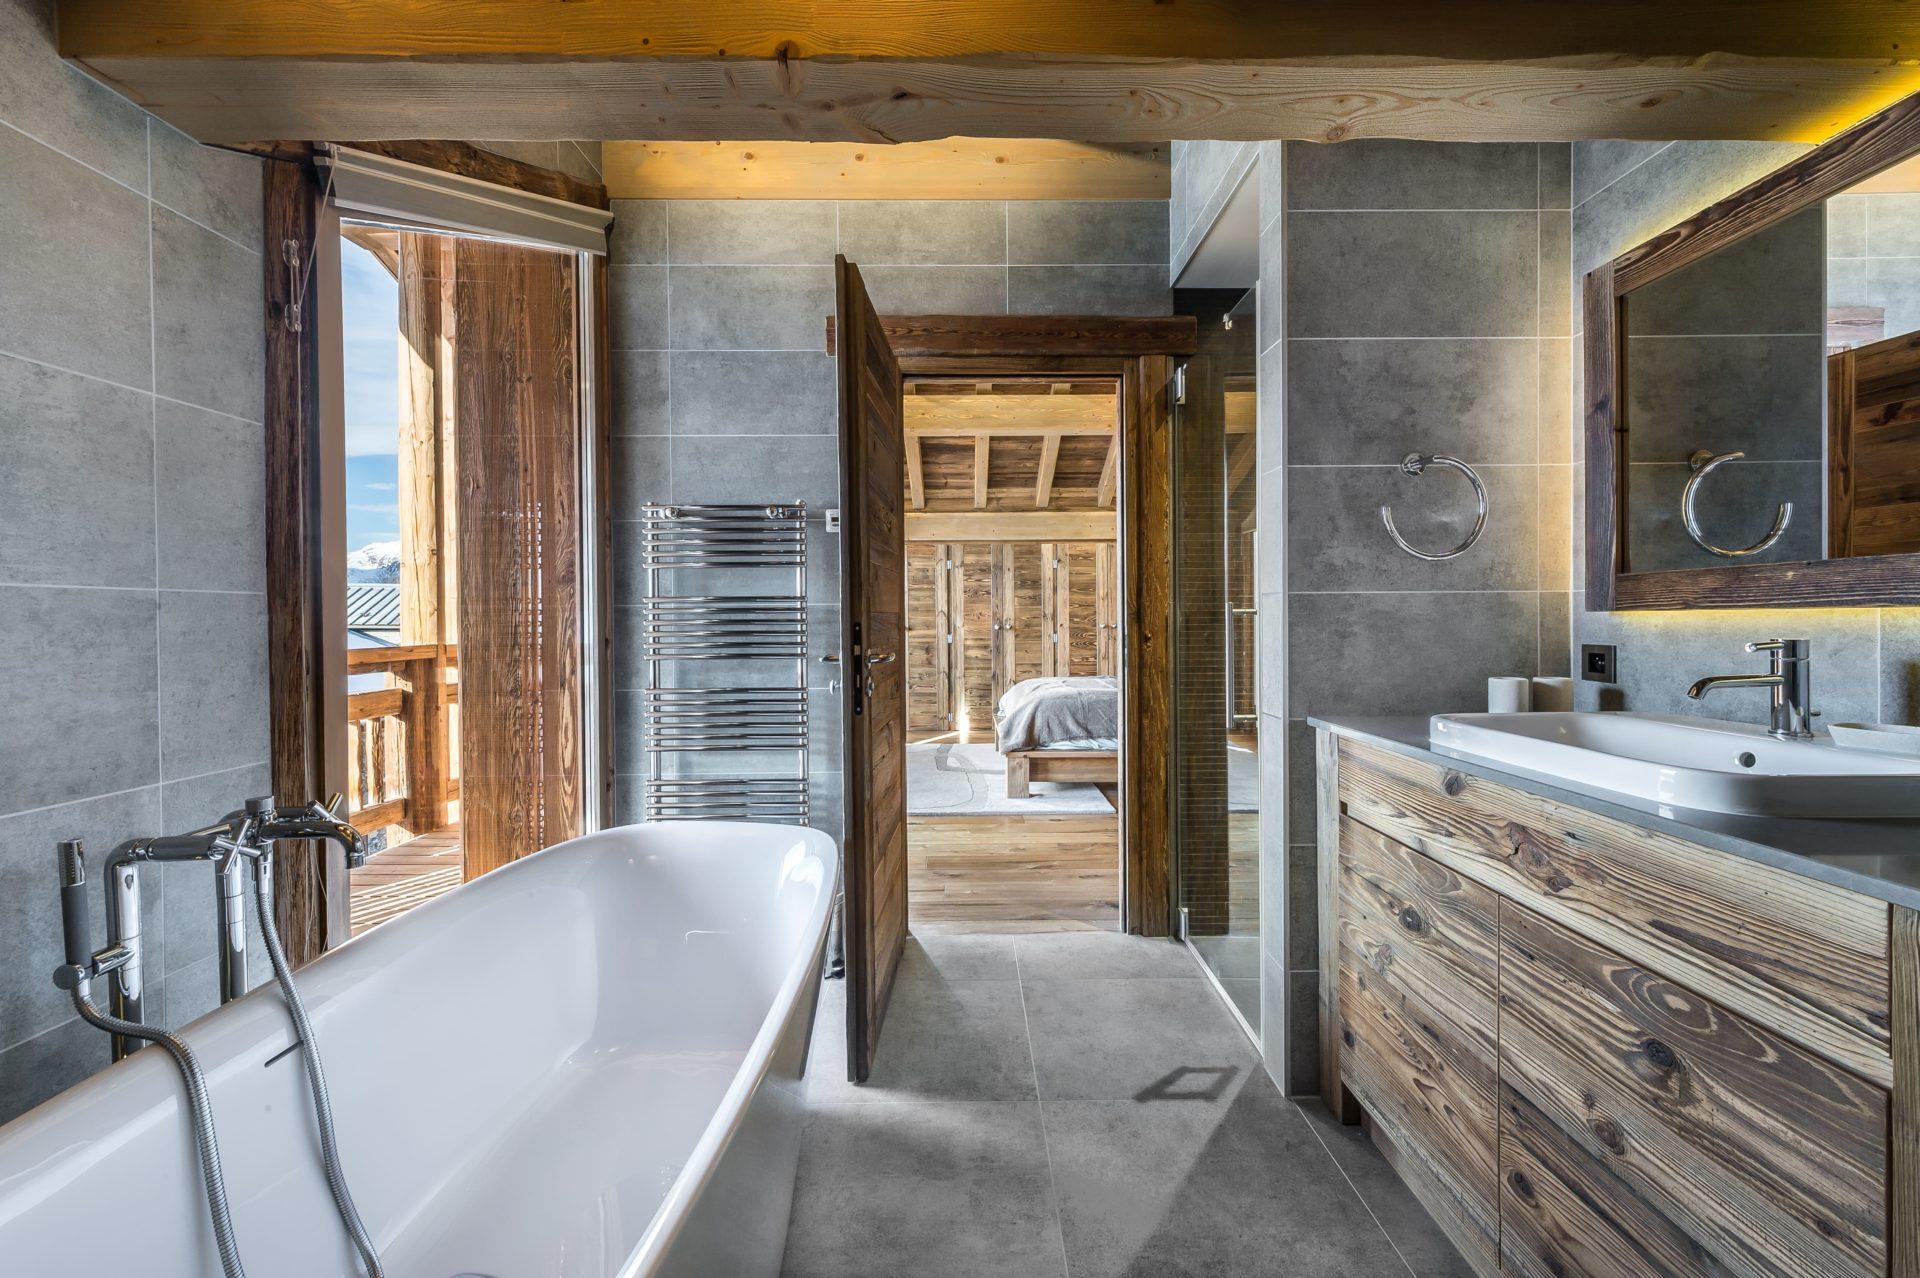 Chalet Chanterelle Salle de bain 1 Villarabout Saint Martin de Belleville, Savoie